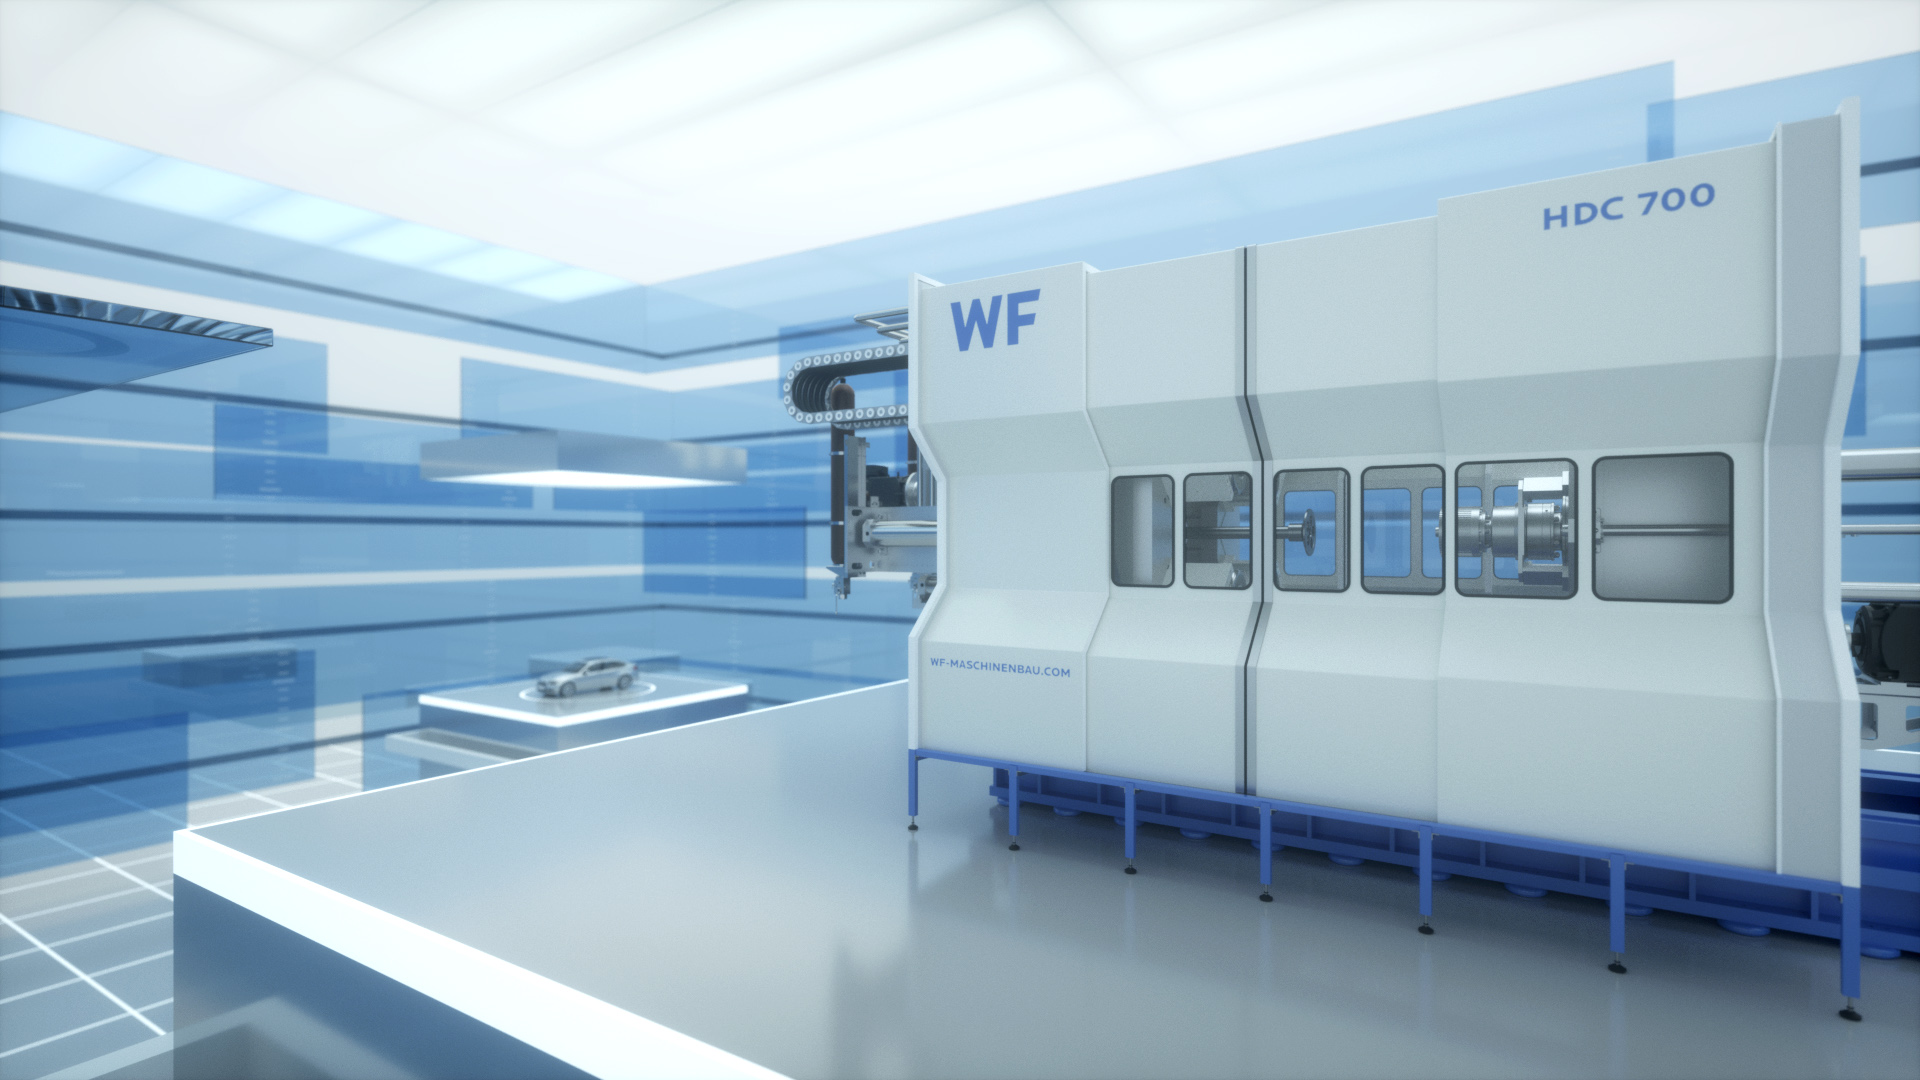 WF HDC 700